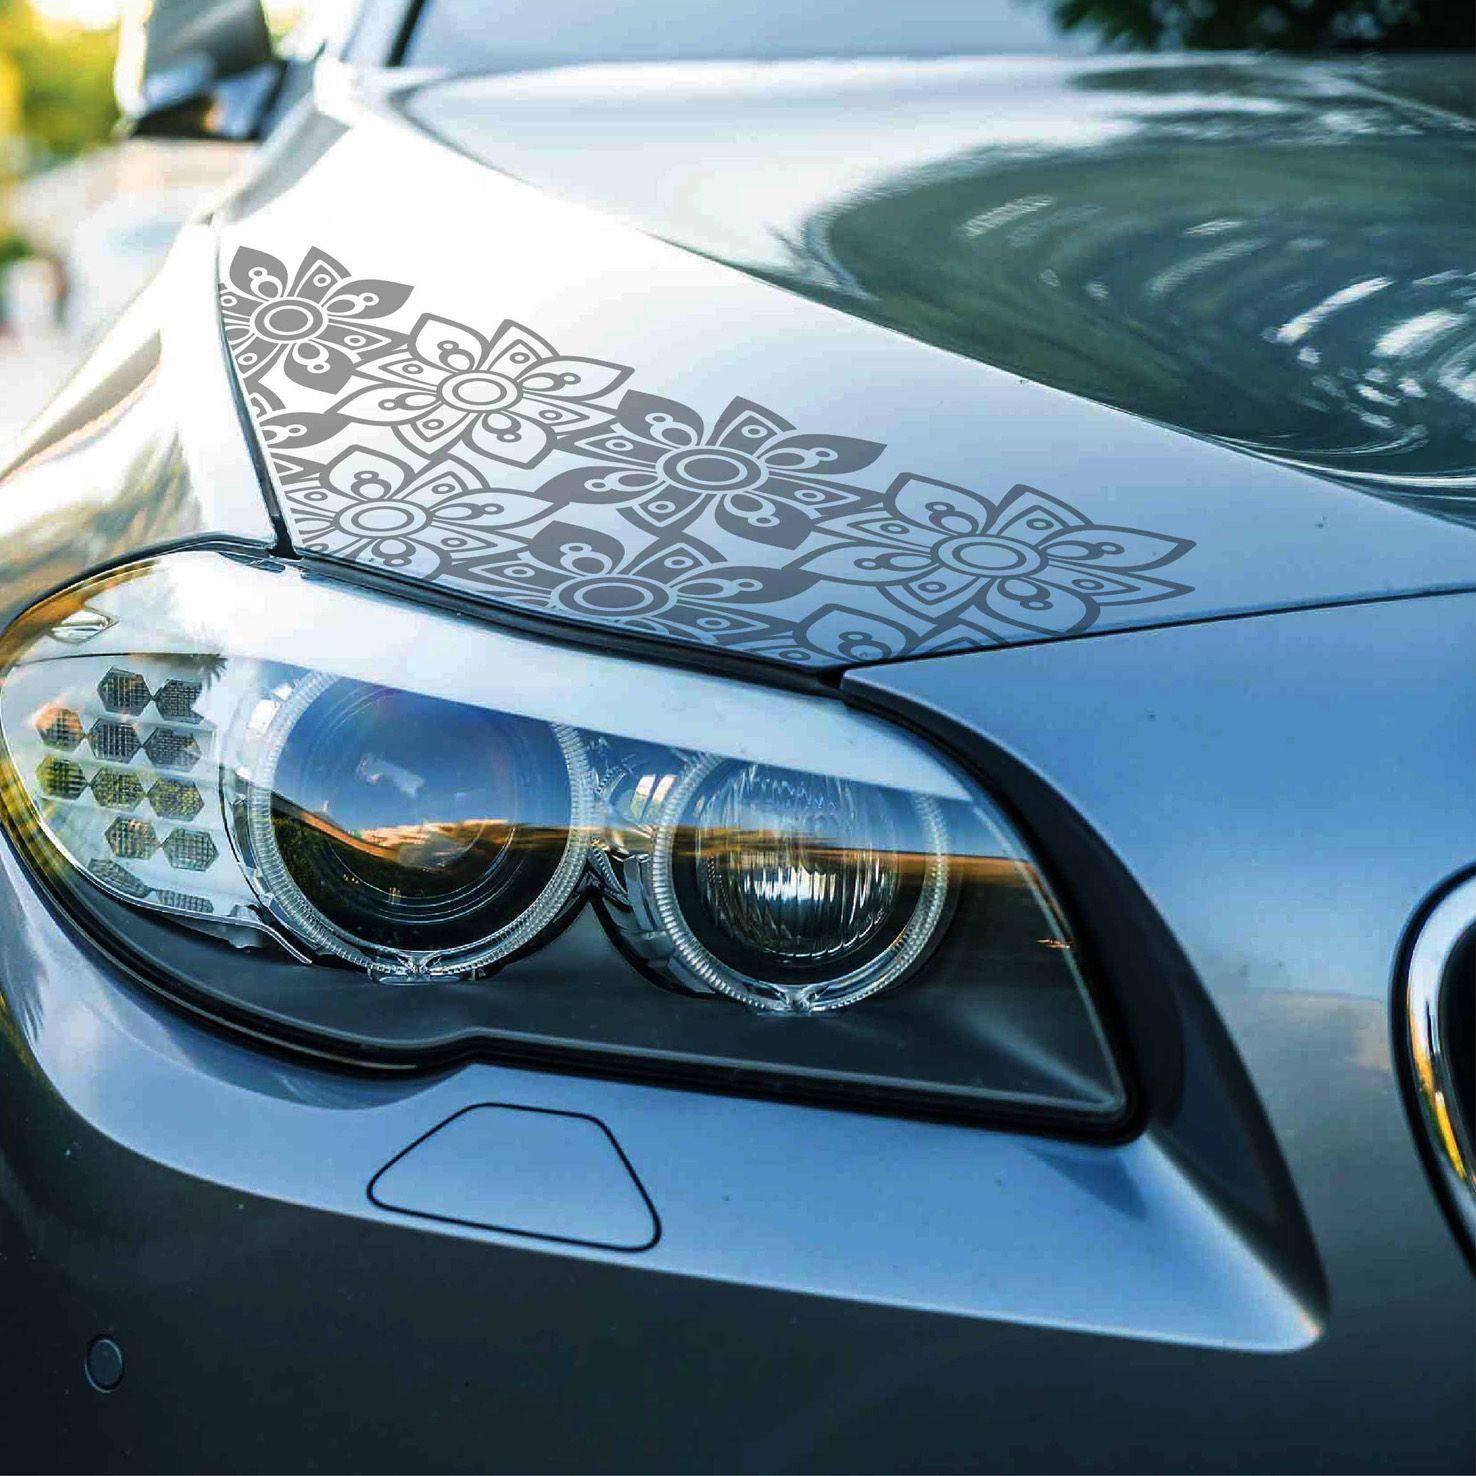 Flower Car Decal Set Cover Boho Scratches Carbon Fiber Etsy Boho Car Accessories Car Decals Car Accessories [ 1476 x 1476 Pixel ]